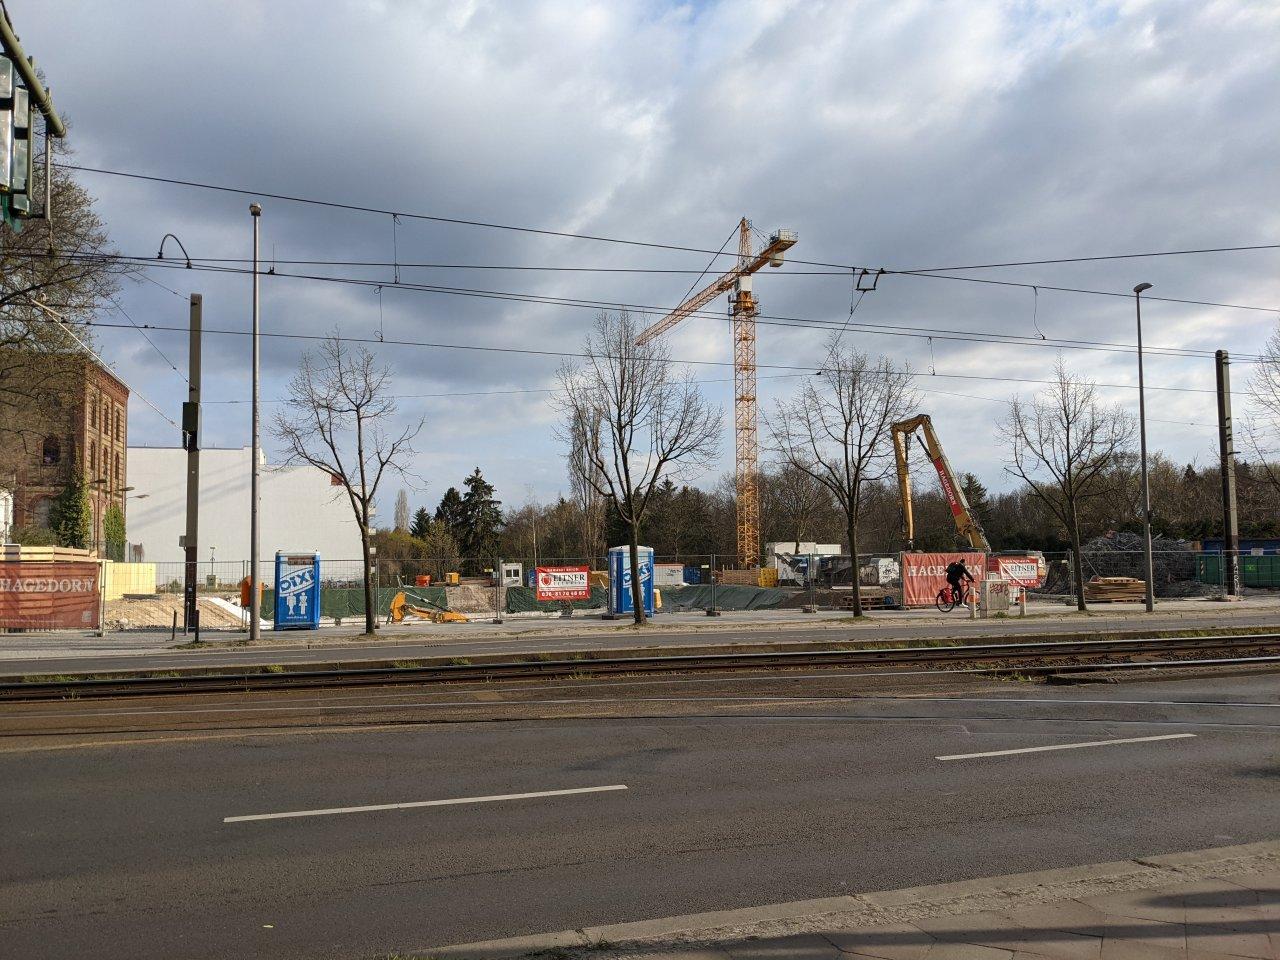 Landsberger-Neubau-Statt-kino.MP.jpg